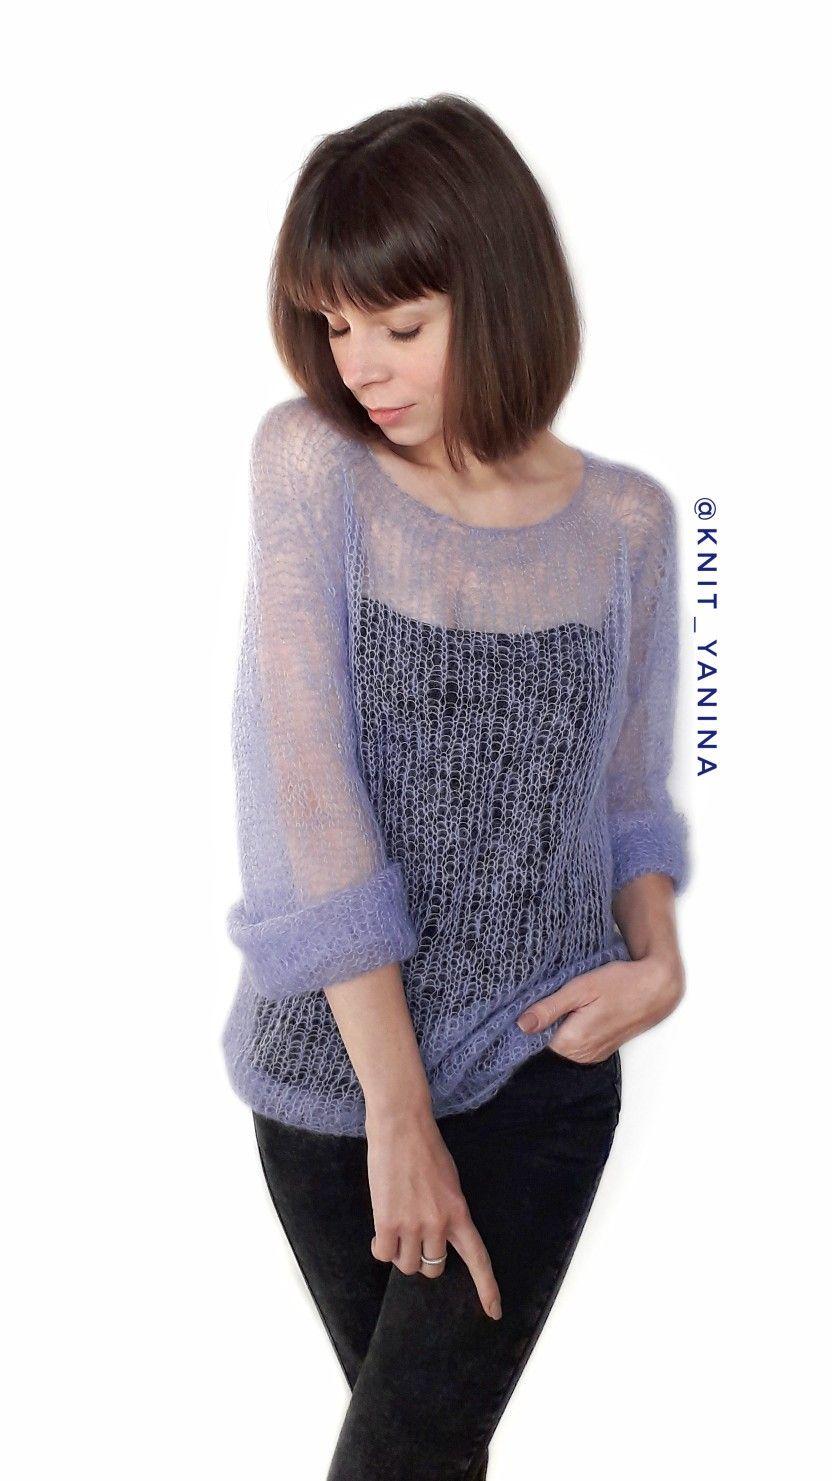 Knit Mohair Sweater Size S Price 50 свитер паутинка из кид